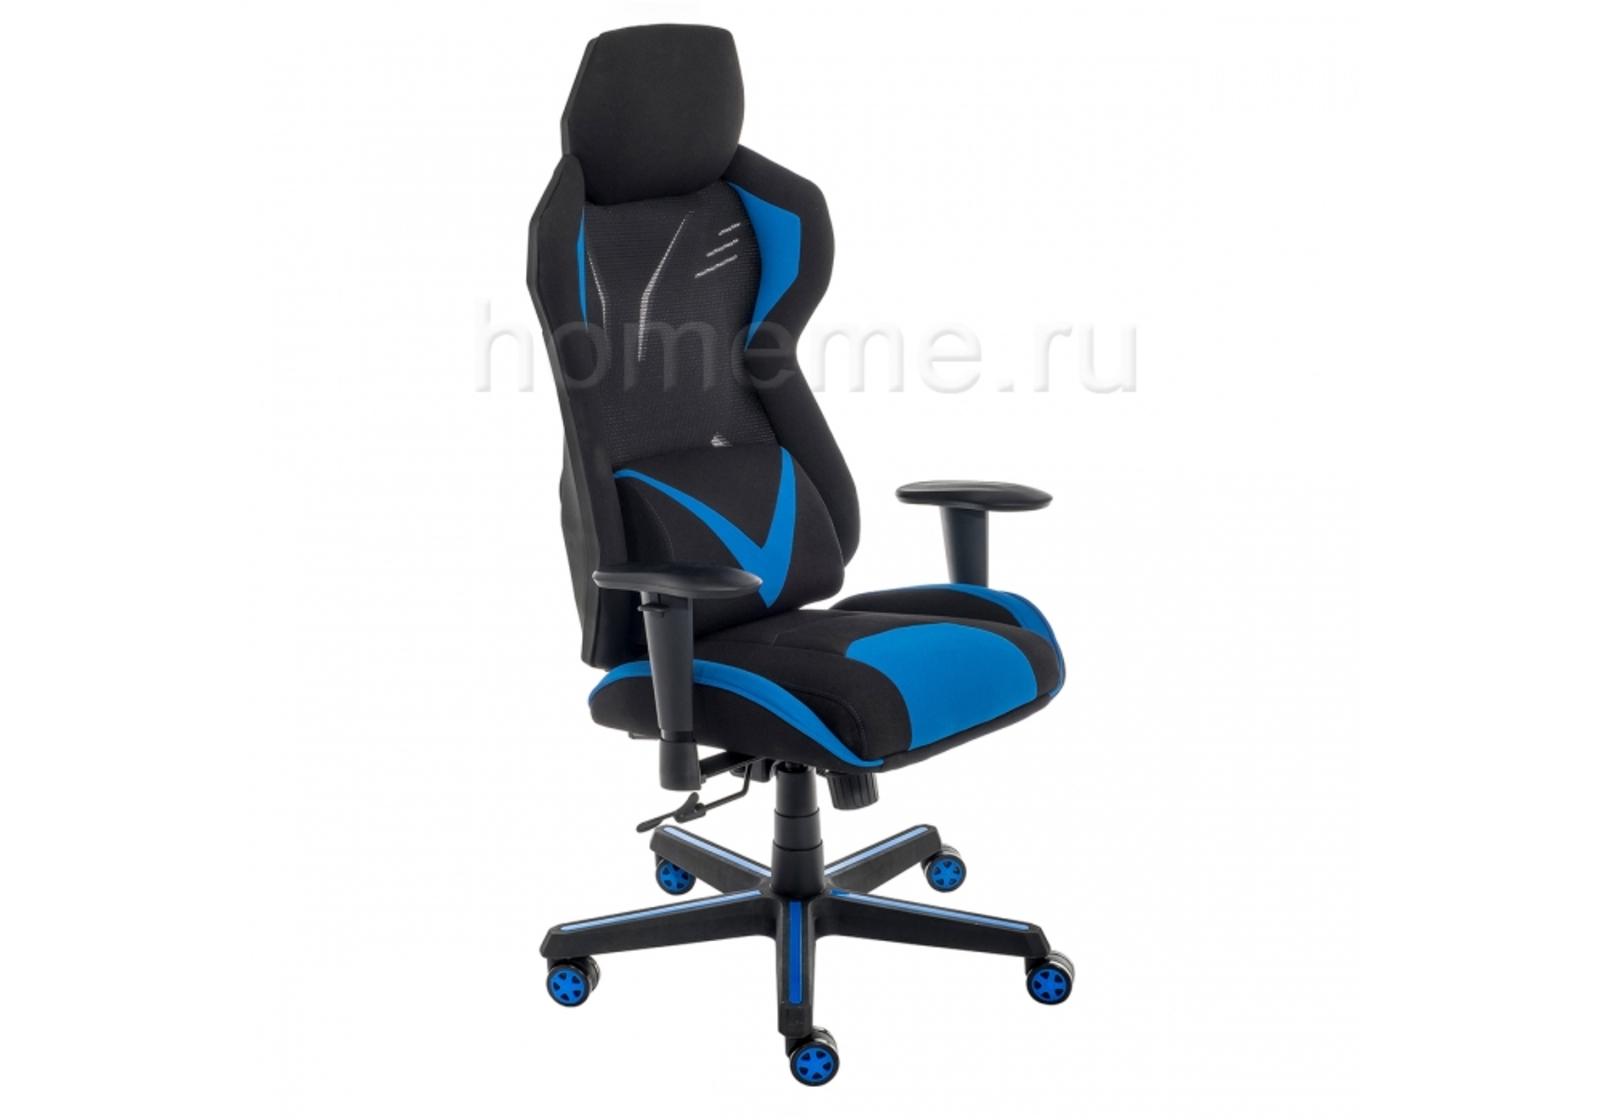 Компьютерное кресло Record синее / черное 11485 Record синее / черное 11485 (17254) фото